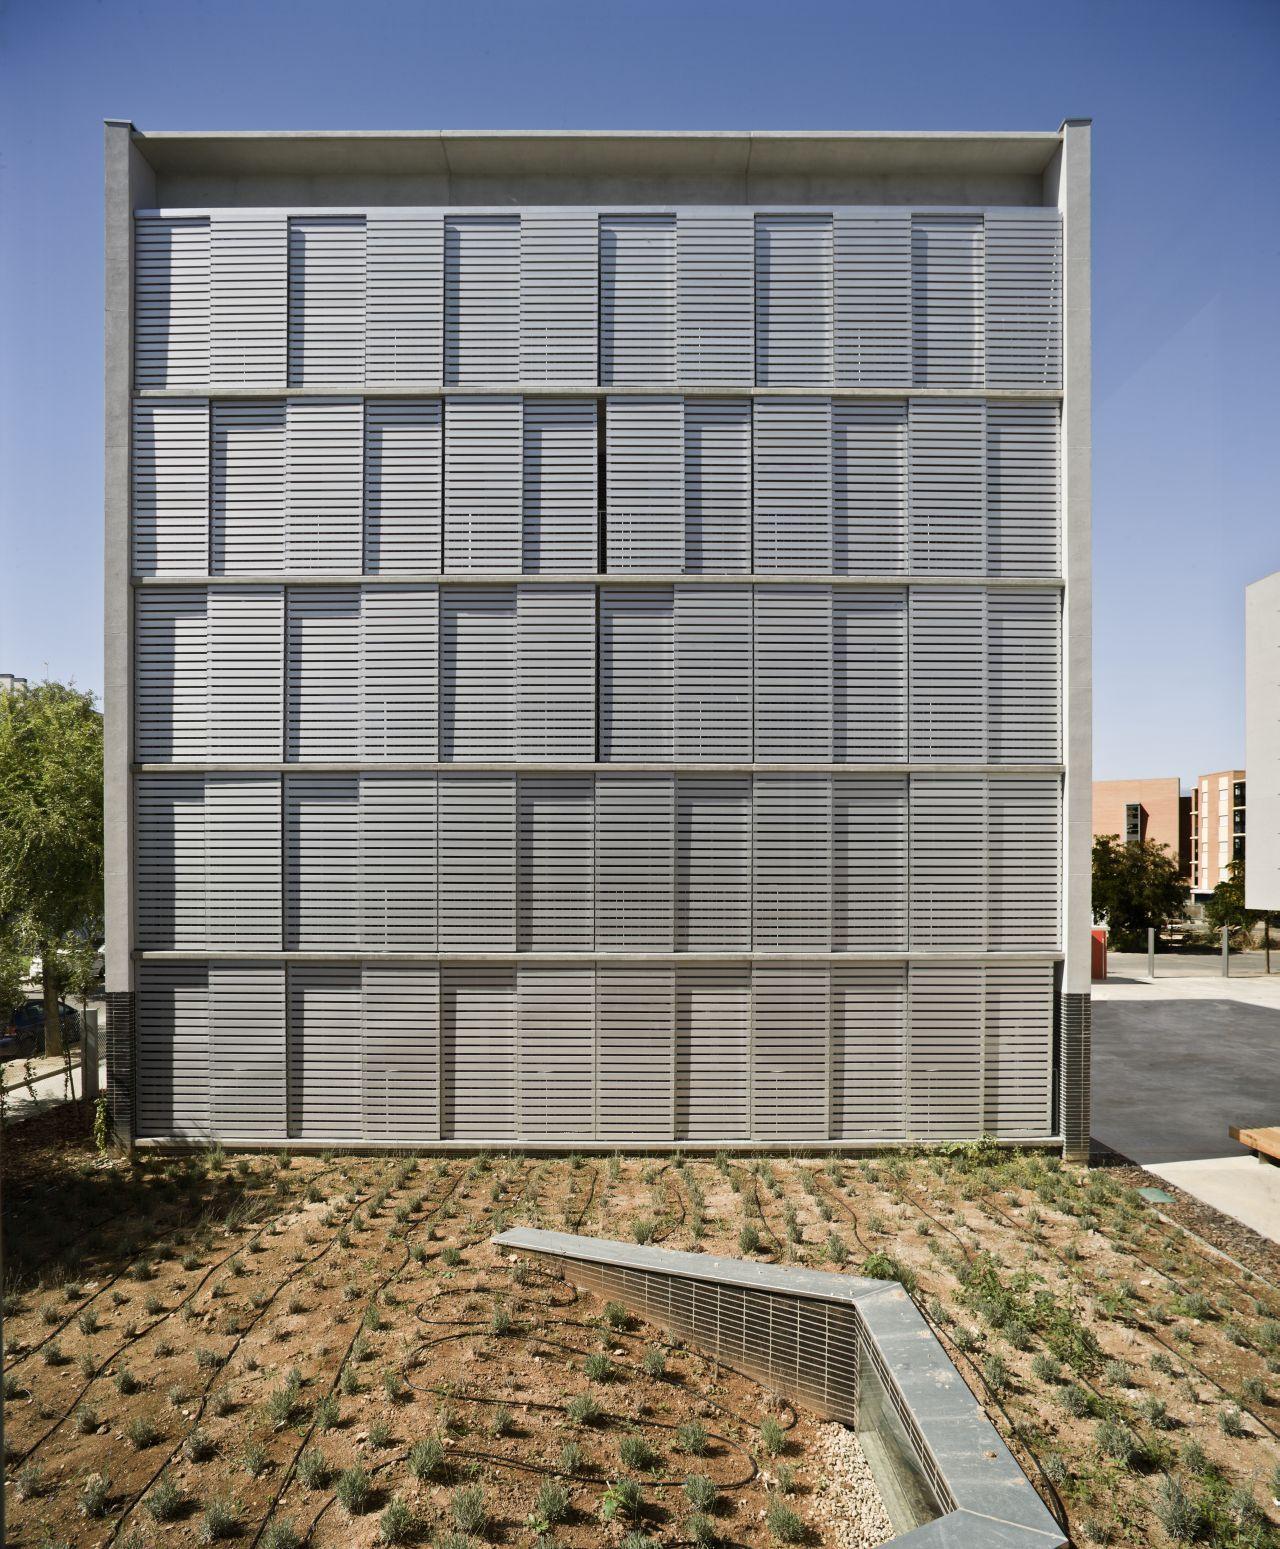 Galeria de conjunto habitacional em albacete burgos garrido arquitectos 7 - Arquitectos albacete ...